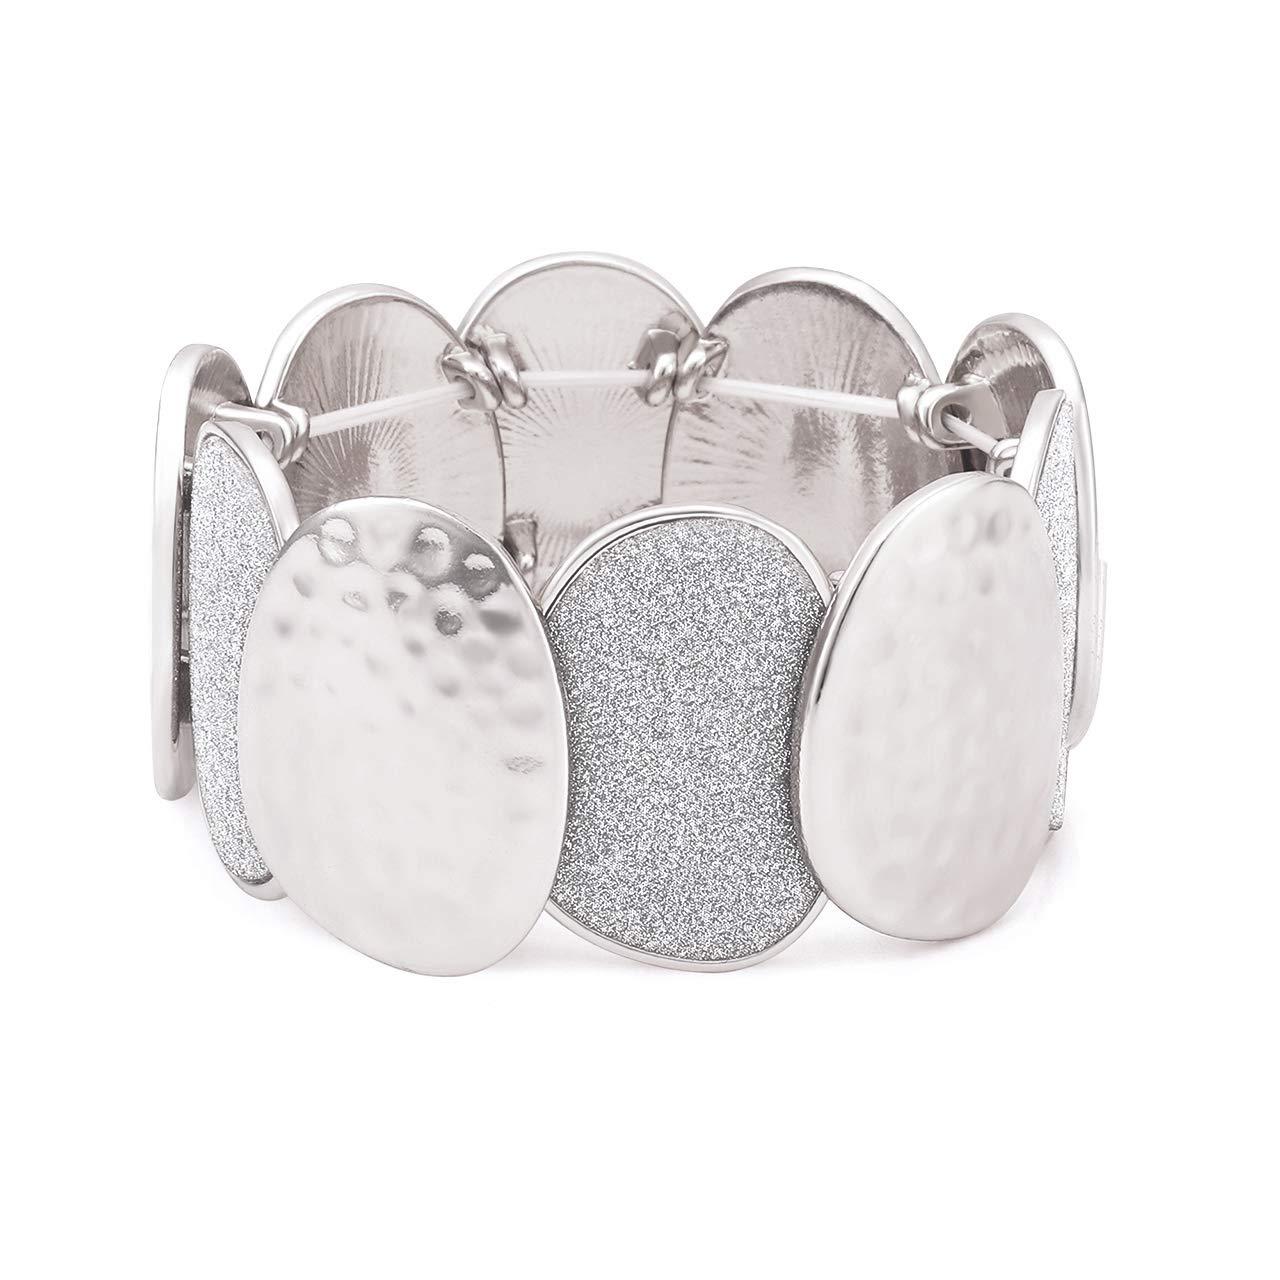 16445a20a Amazon.com: Seni Jewelry Hammered Druzy Bracelet Silver Glitter Chunky  Stretch Bracelet Statement Elastic Bracelet Bangle for Women Girls  (Silver): Jewelry